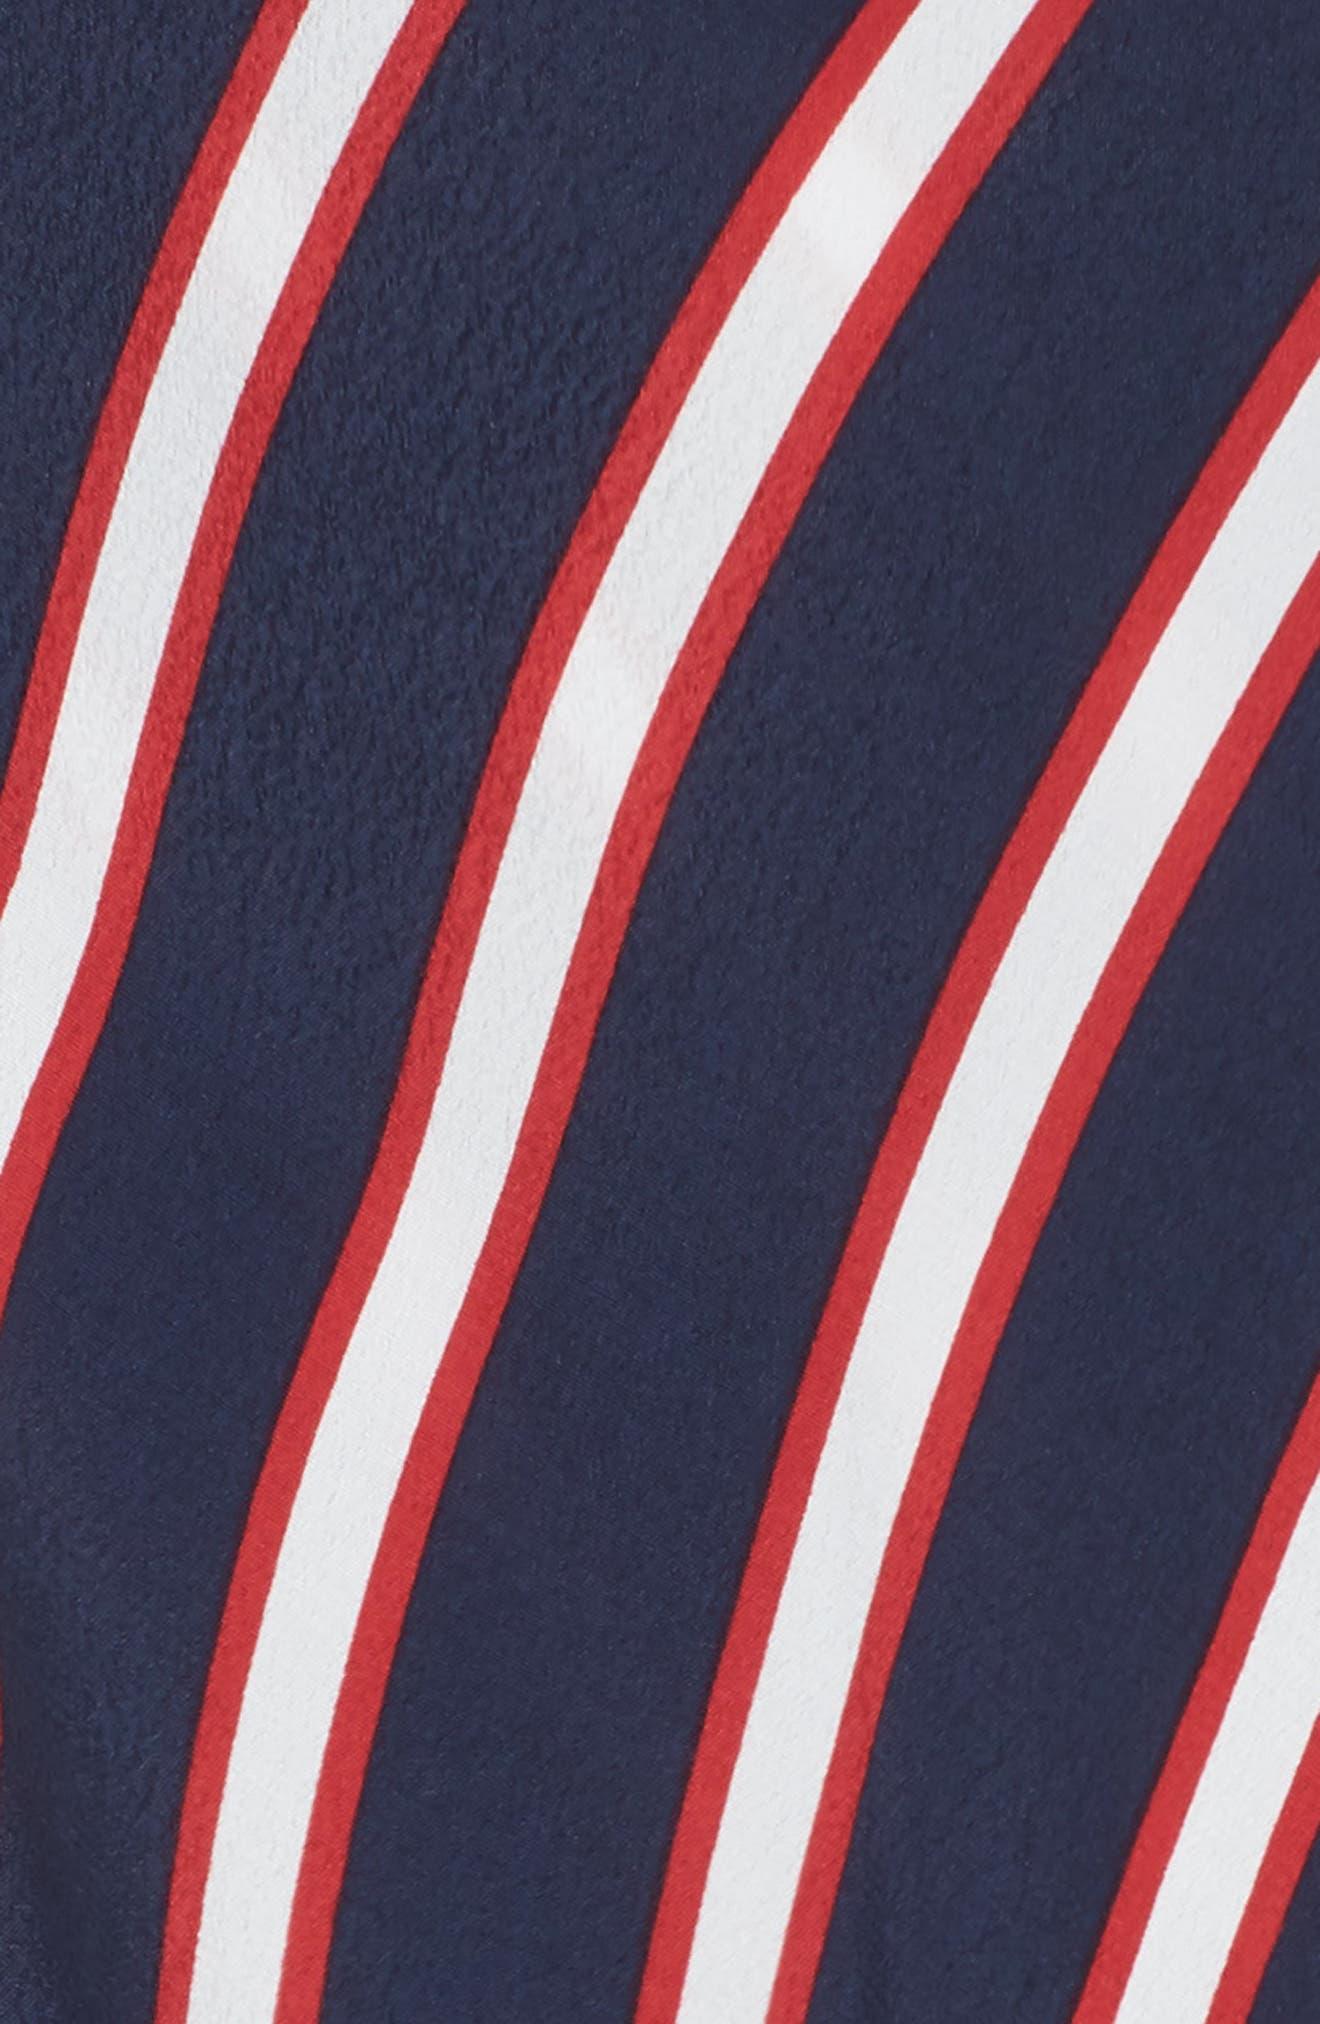 Stripe Midi Wrap Skirt,                             Alternate thumbnail 5, color,                             Navy Peacoat Awning Stripe